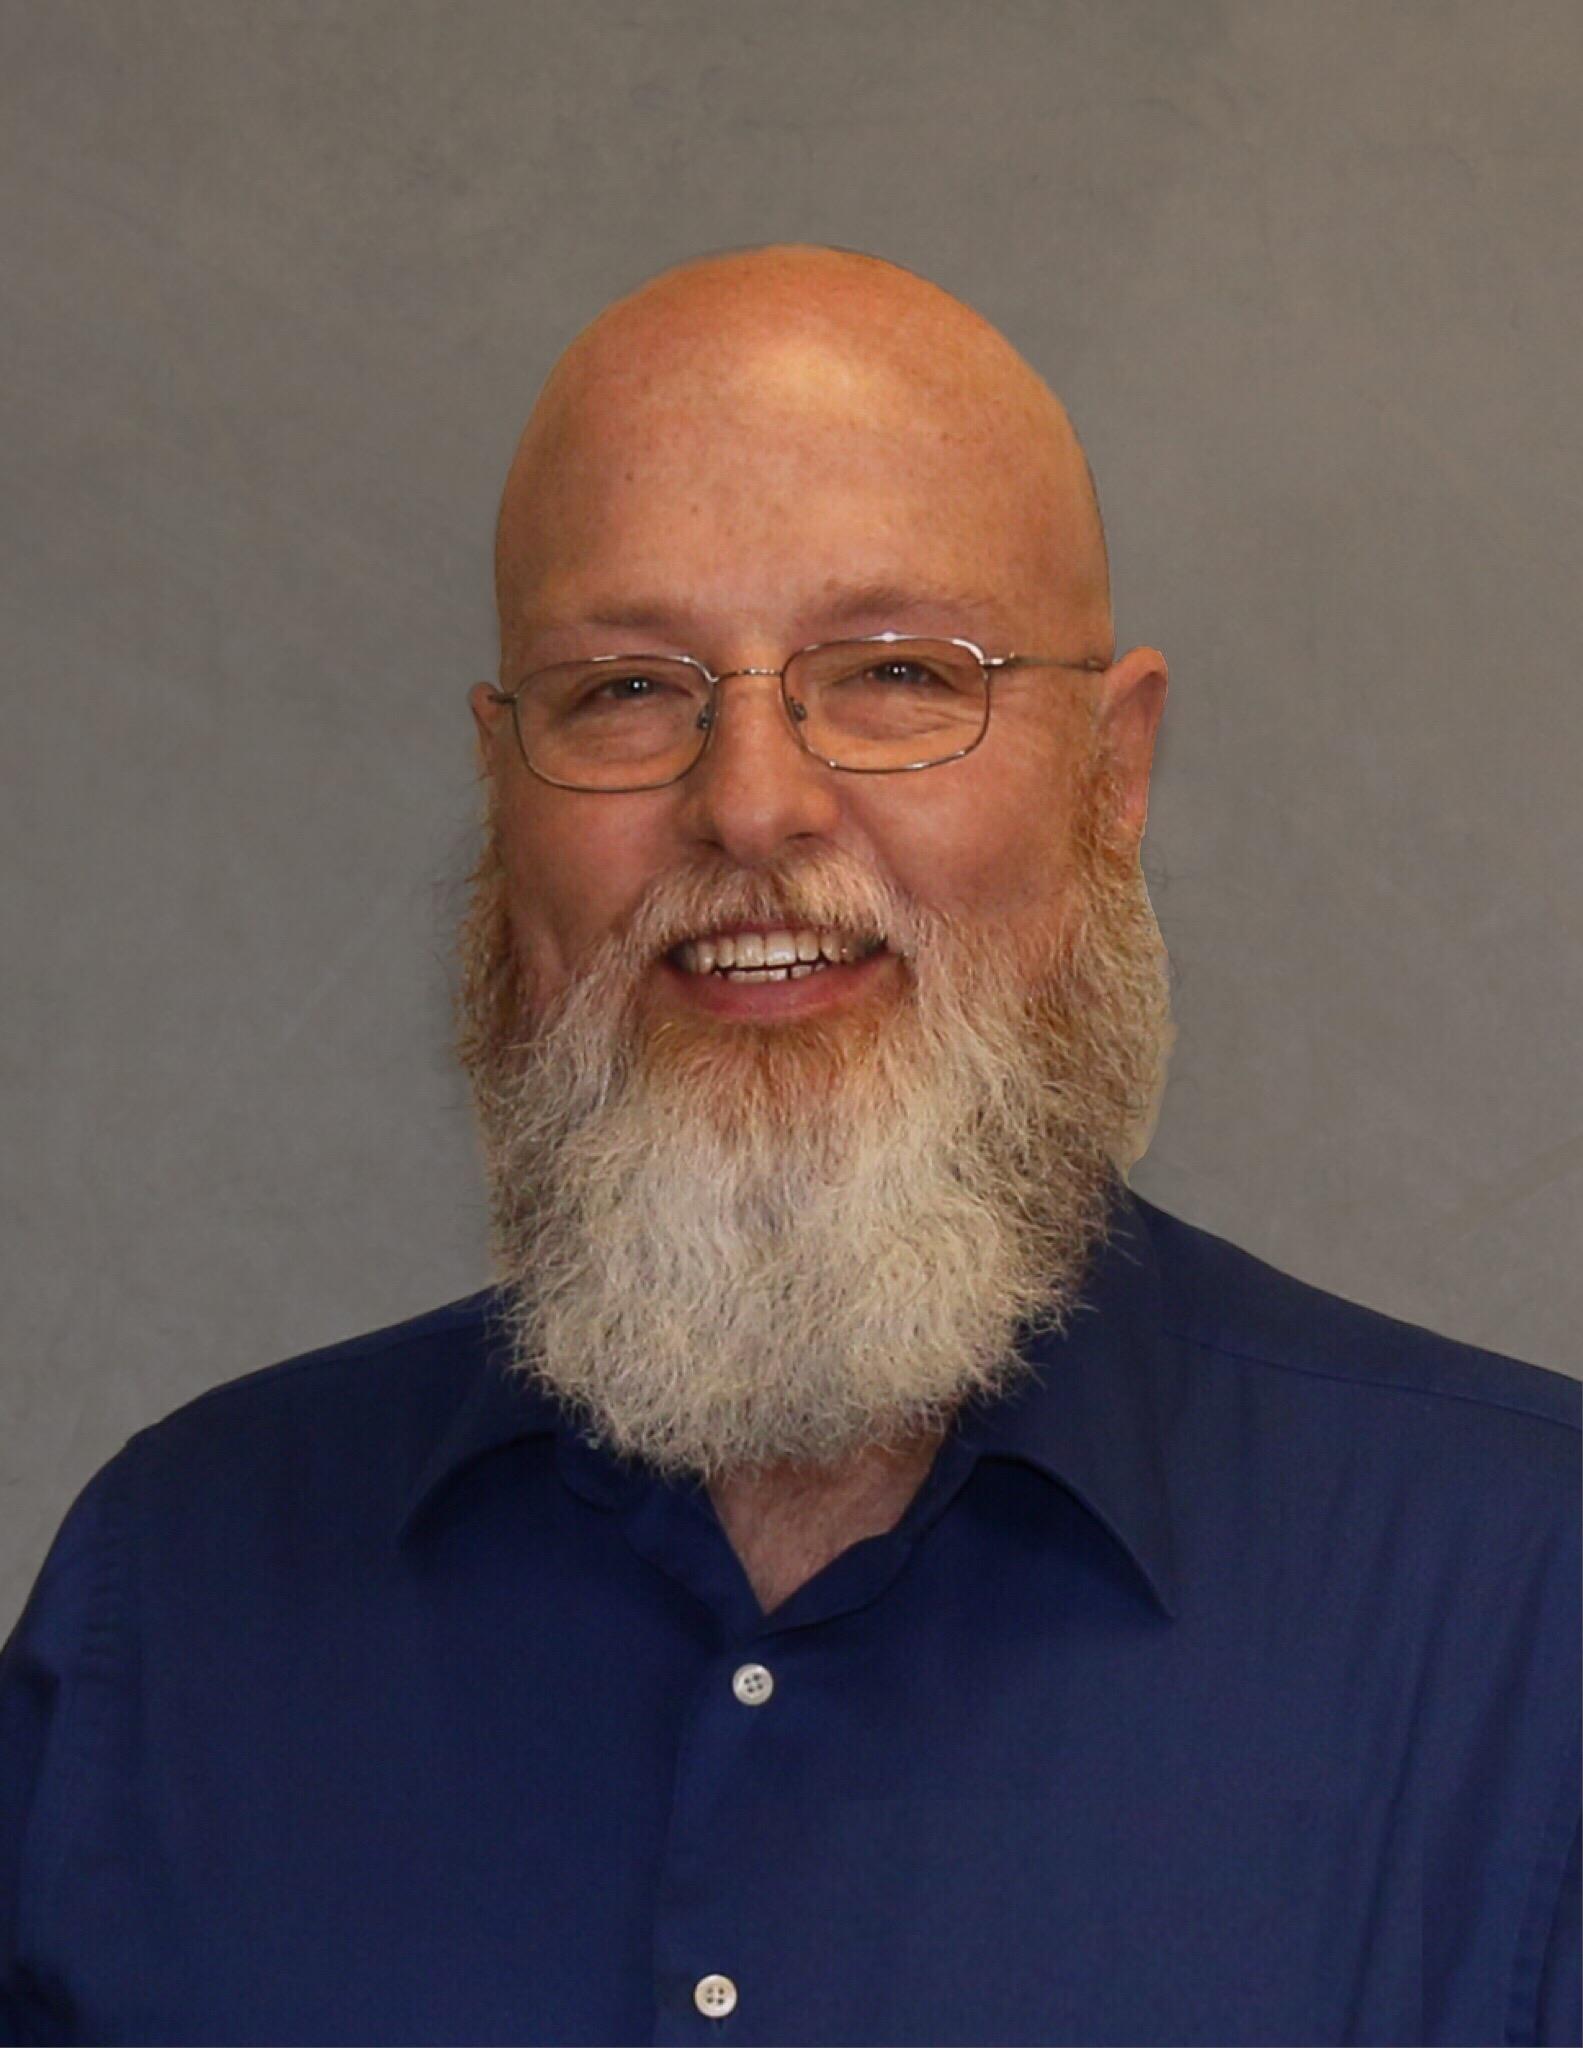 Kris Roberson, MIT